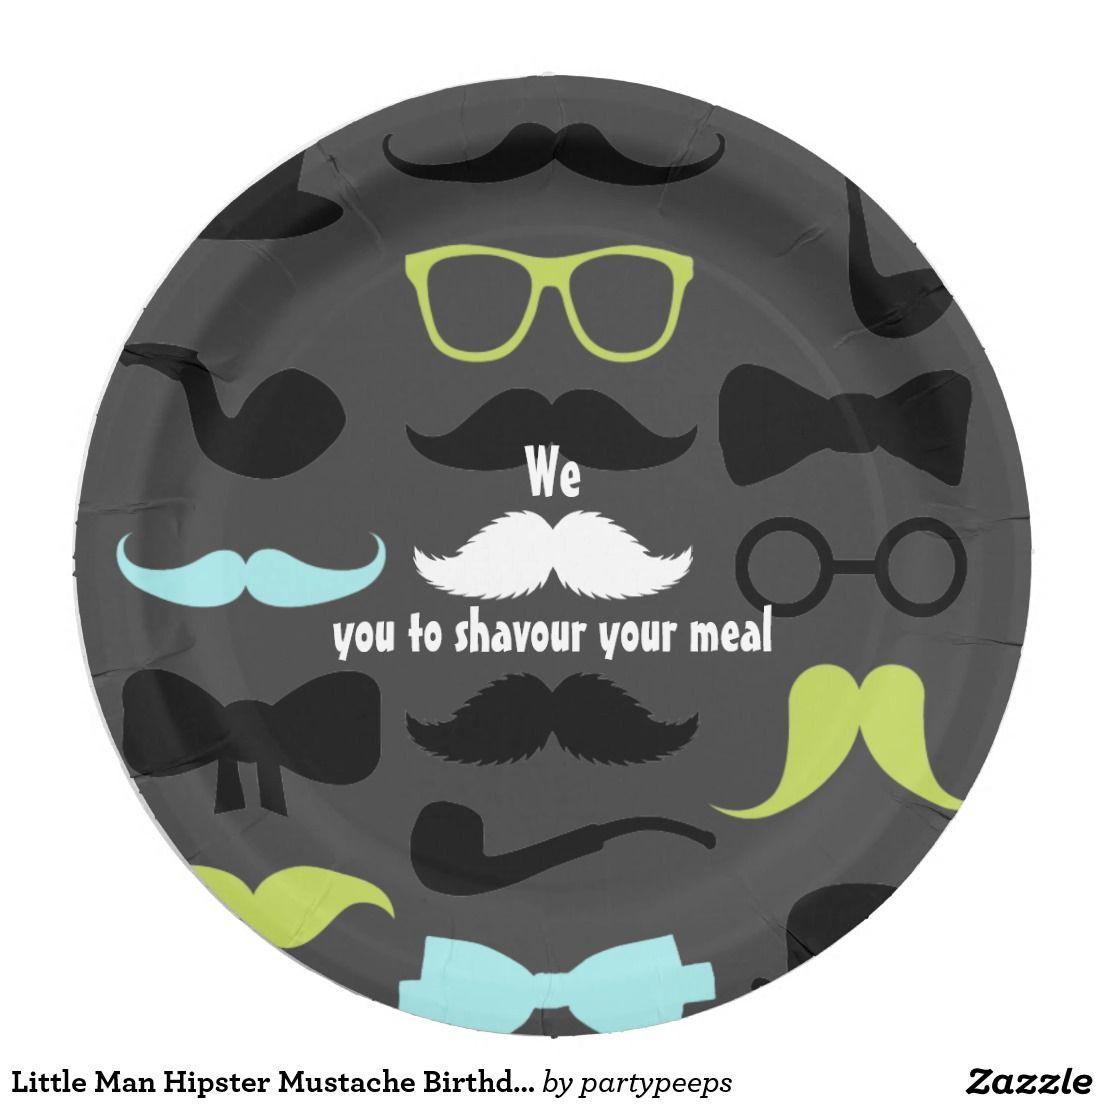 Little Man Hipster Mustache Birthday Party Paper Plate  sc 1 st  Pinterest & Little Man Hipster Mustache Birthday Party | Custom Party PAPER ...